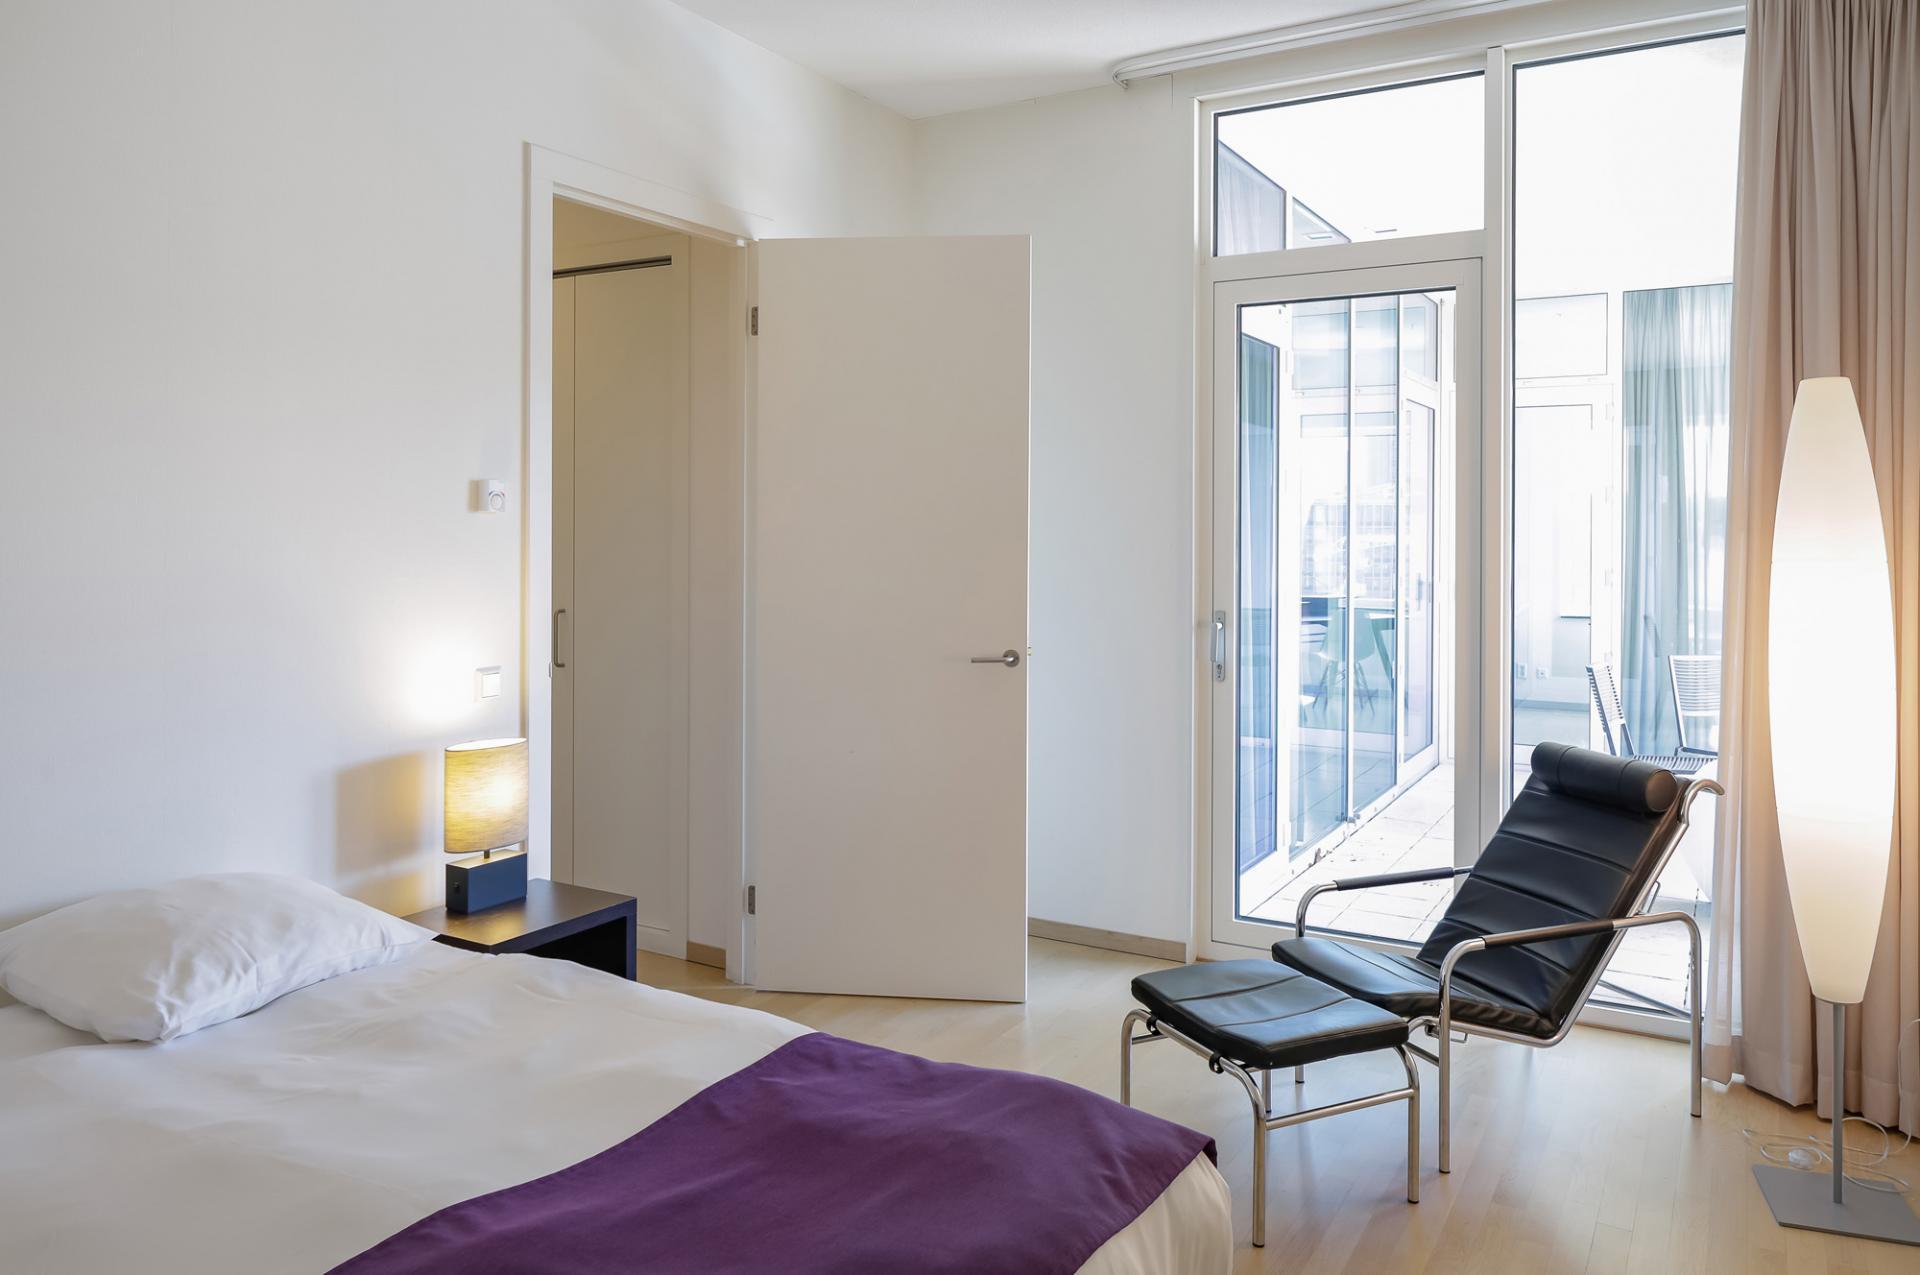 Double bedroom at New Orleans Apartments, Kop Van Zuid, Rotterdam - Citybase Apartments